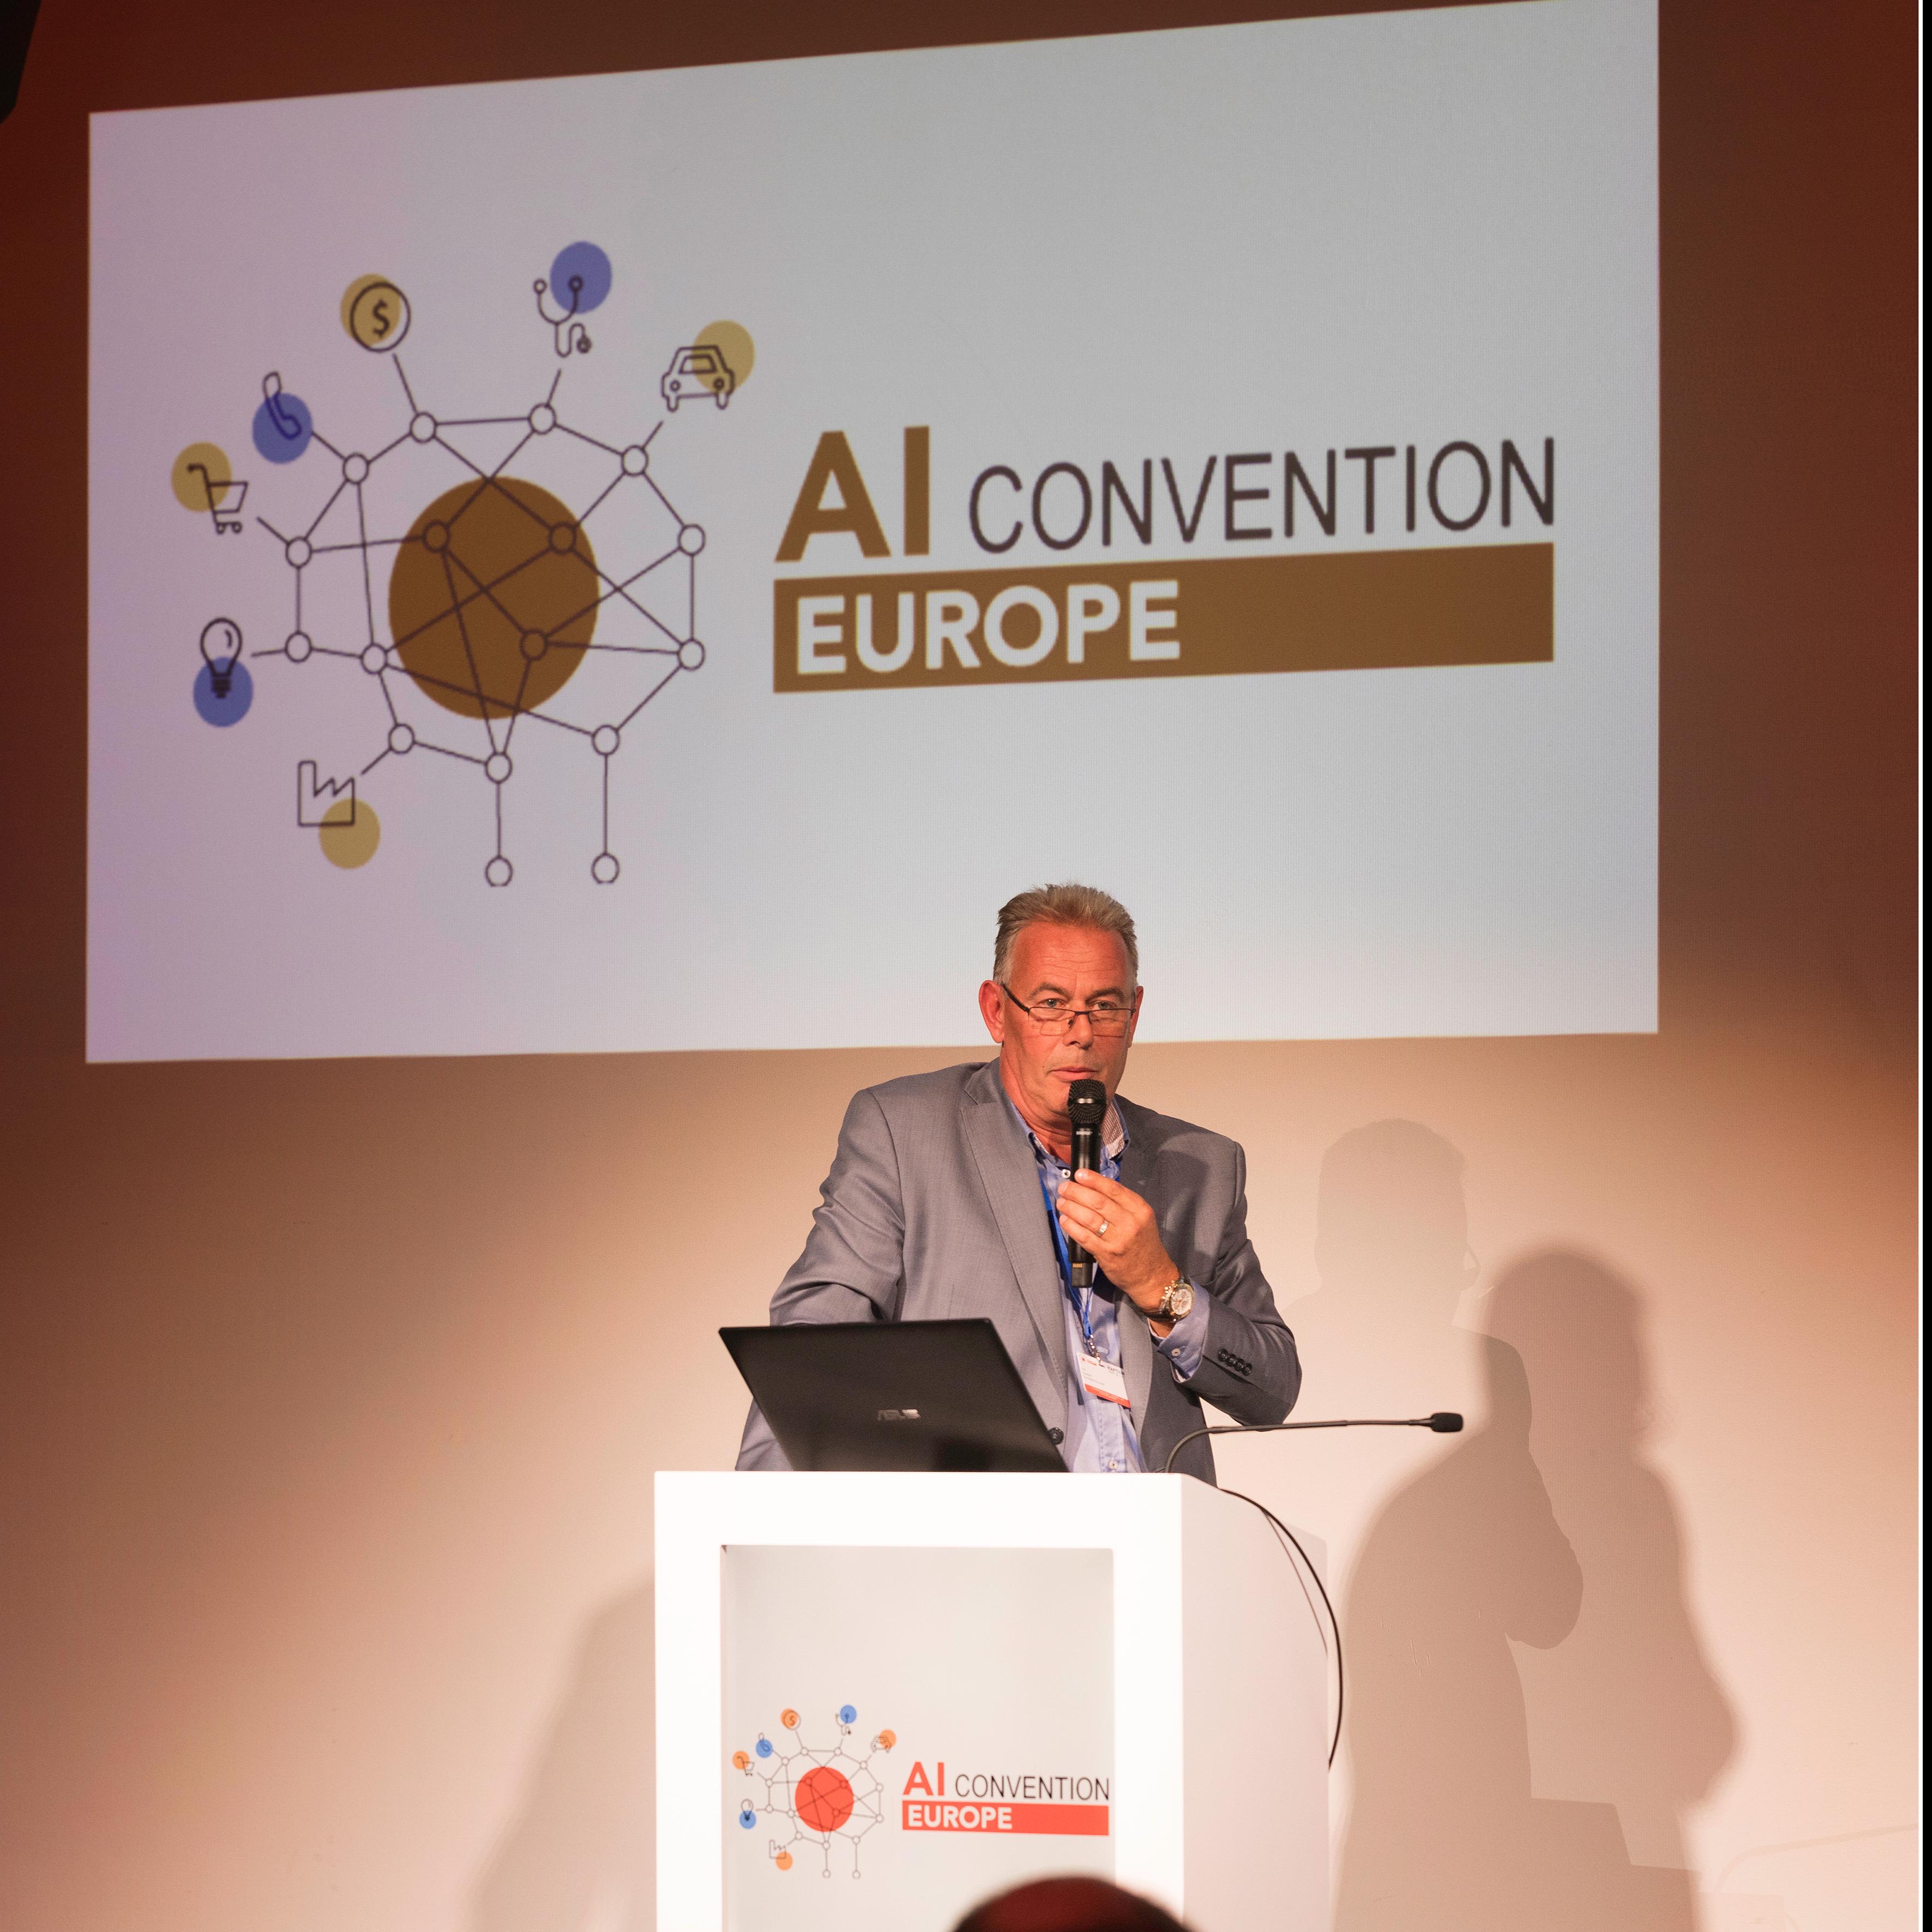 Luc AI convention europe